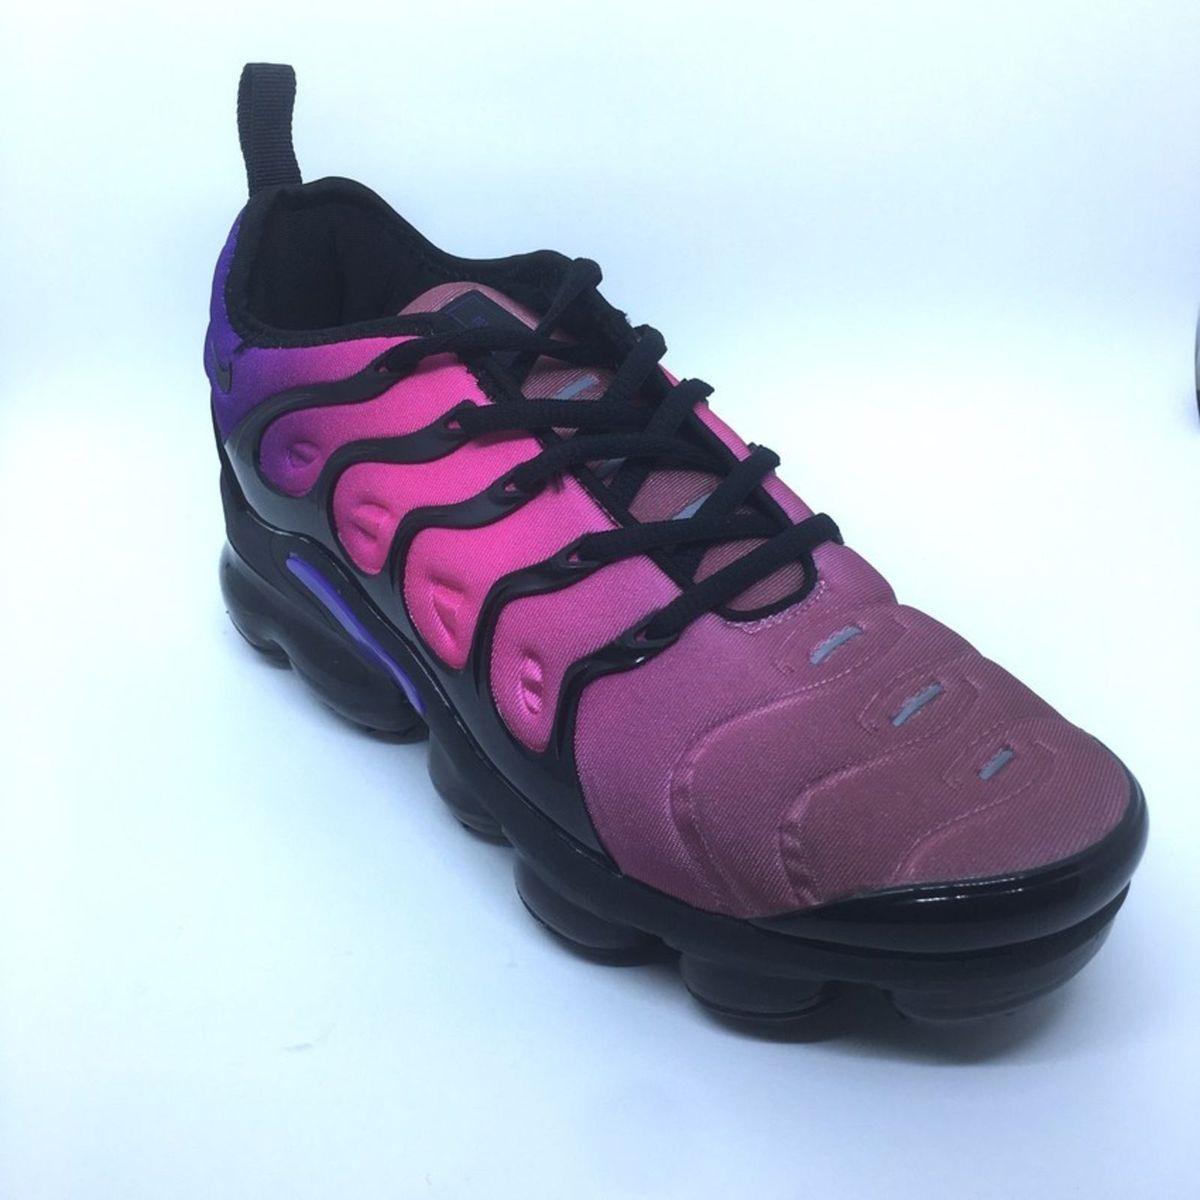 956b63240a4 Tenis Nike Vapormax Plus